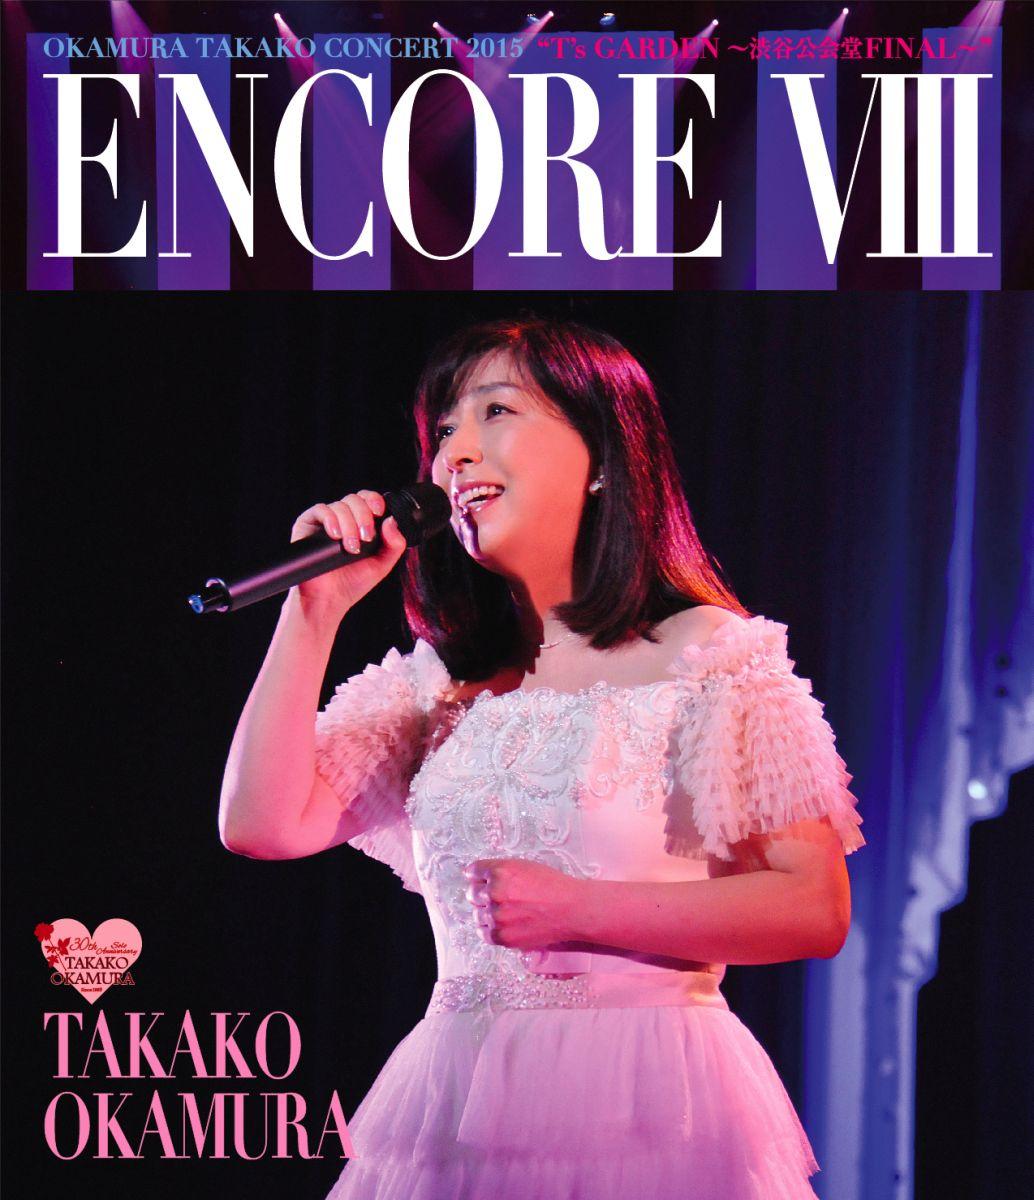 "ENCORE VIII OKAMURA TAKAKO CONCERT 2015 ""T's GARDEN 〜渋谷公会堂 FINAL〜""【Blu-ray】 [ 岡村孝子 ]"